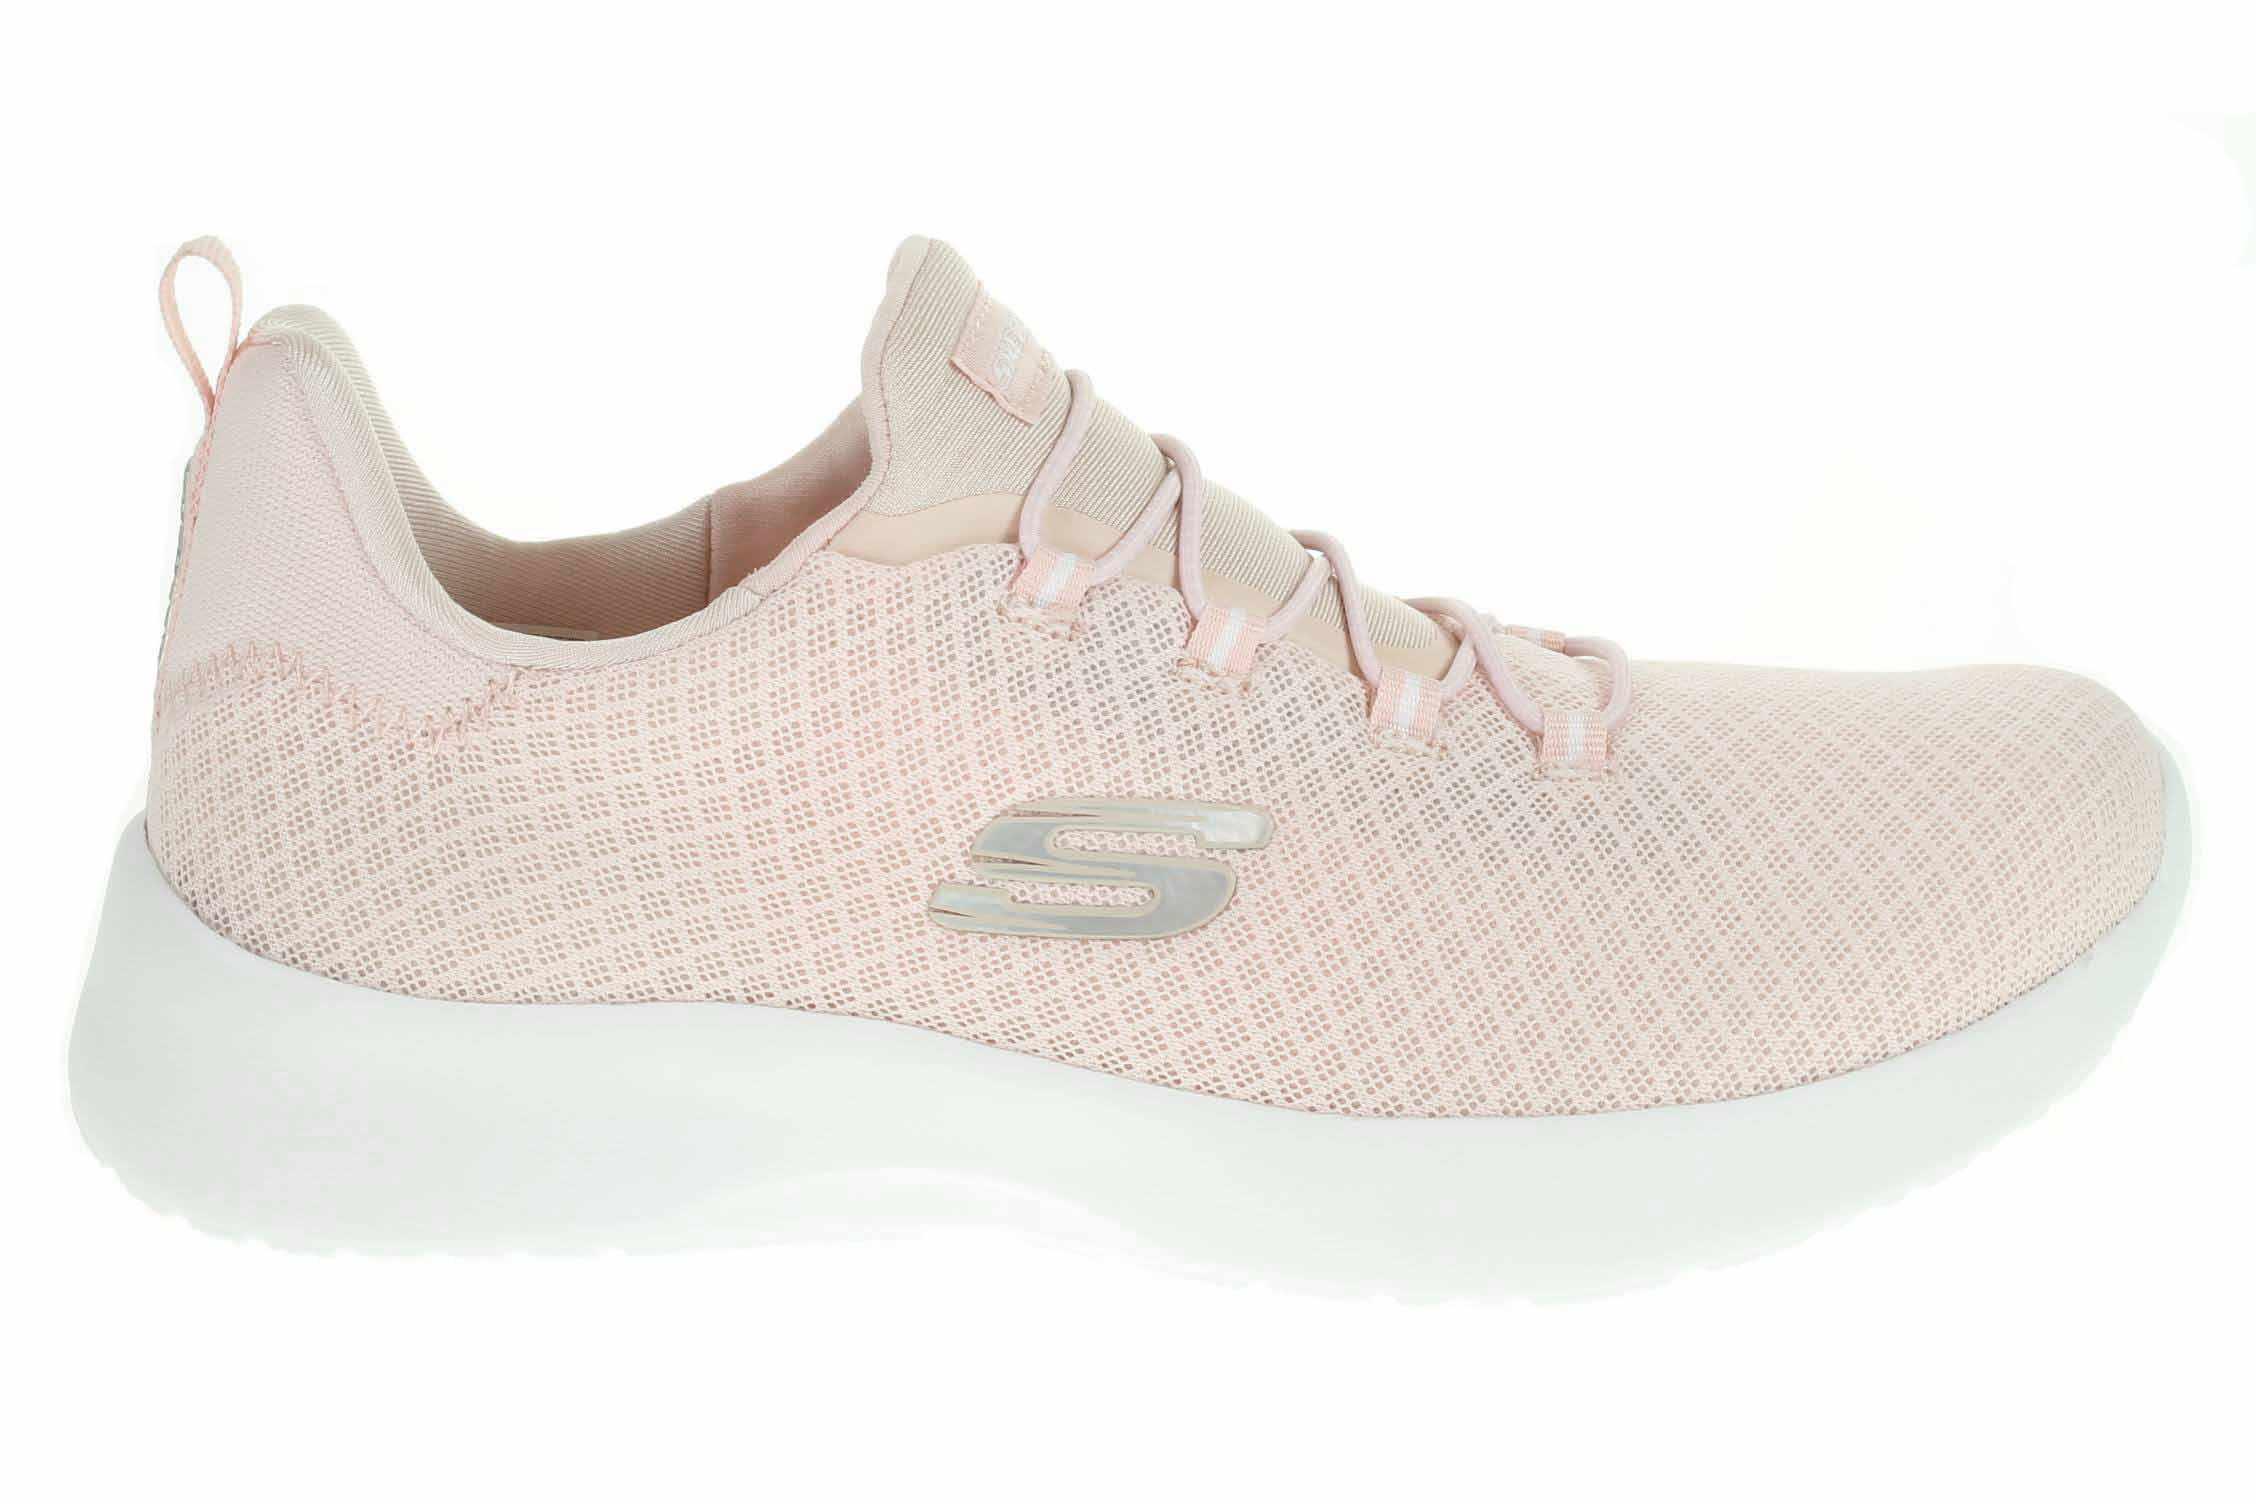 4f1c1037b03 Dámská obuv